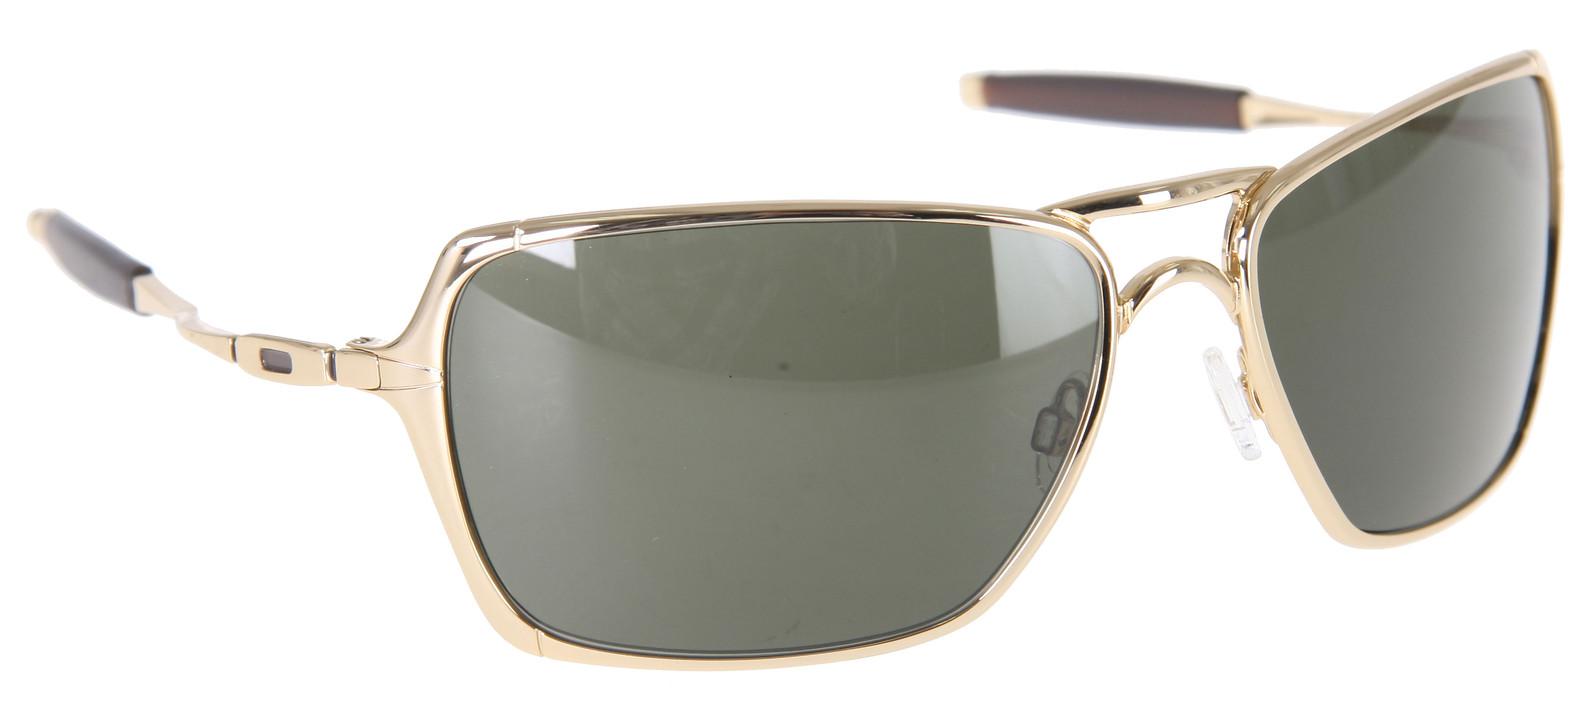 oakley inmate sunglasses